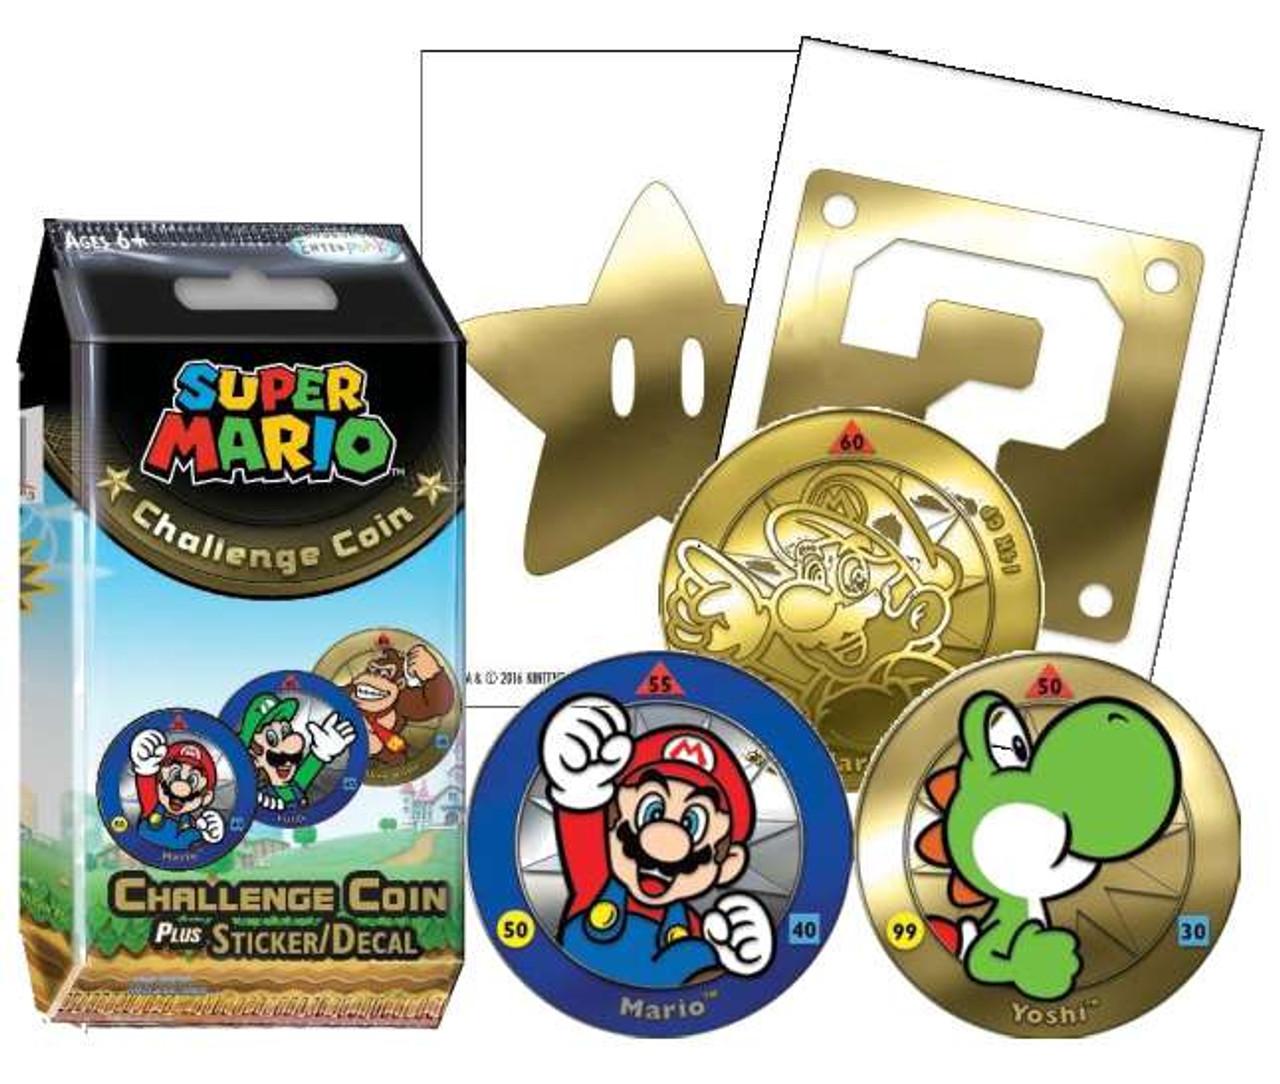 Super Mario Super Mario Challenge Coin Box 24 Packs